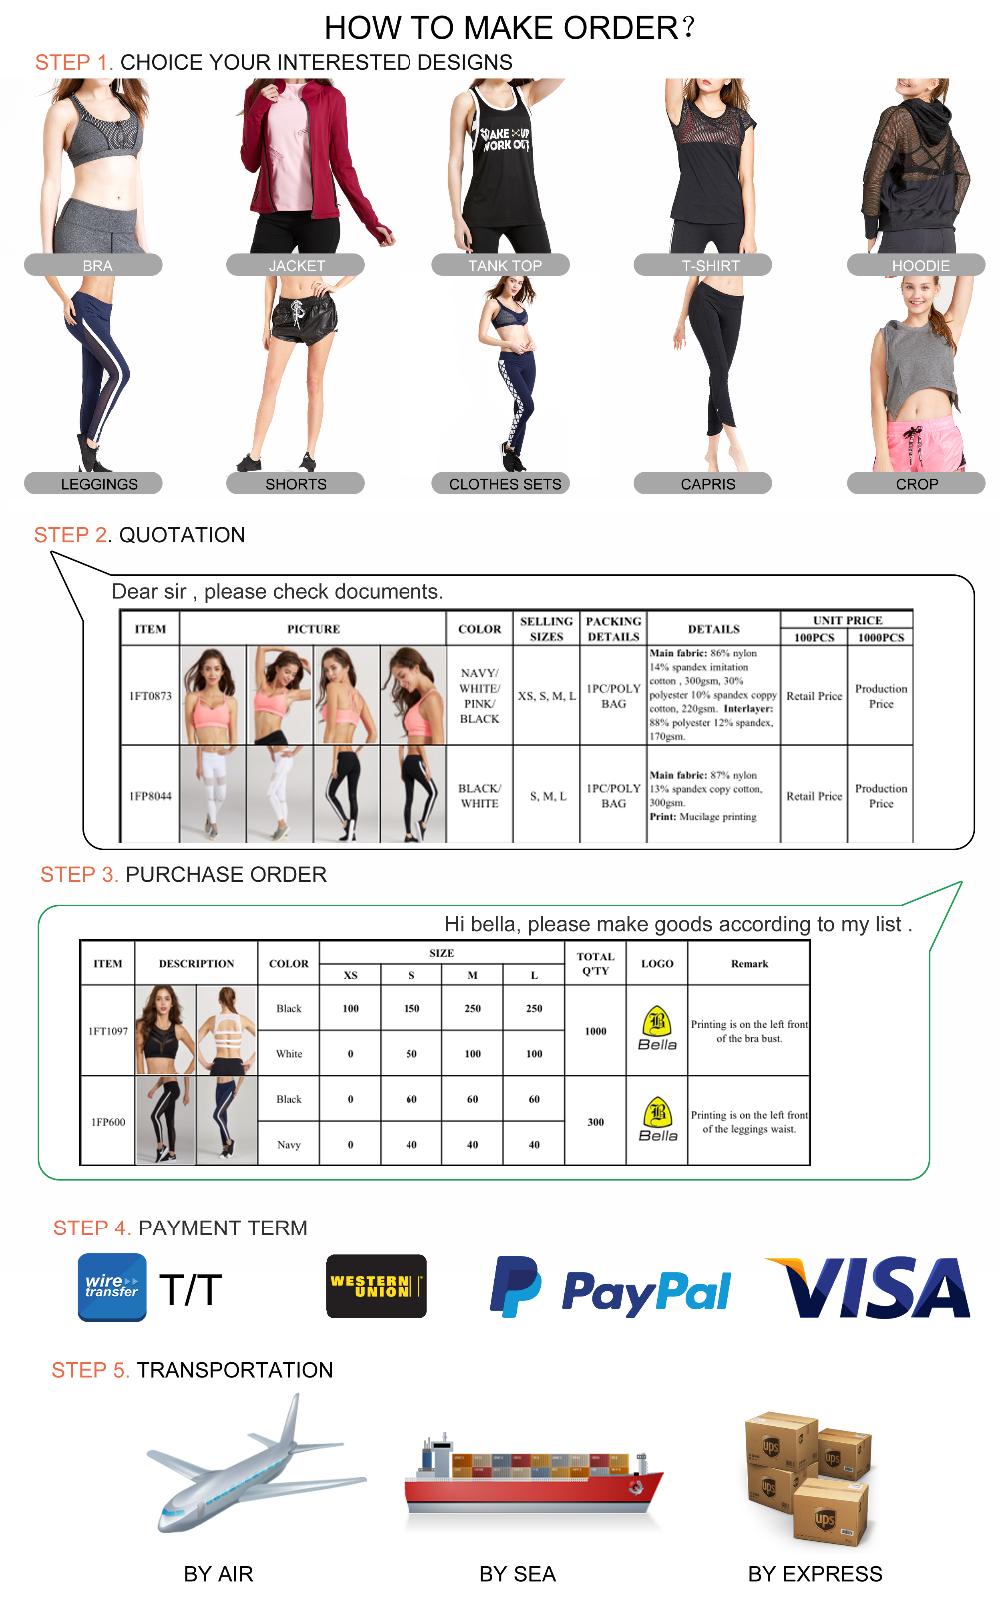 HTB1OKUZQXXXXXaGaXXX760XFXXX7 bella d 21055 womens yoga shorts buy womens yoga shorts product,Bella D Womens Clothing